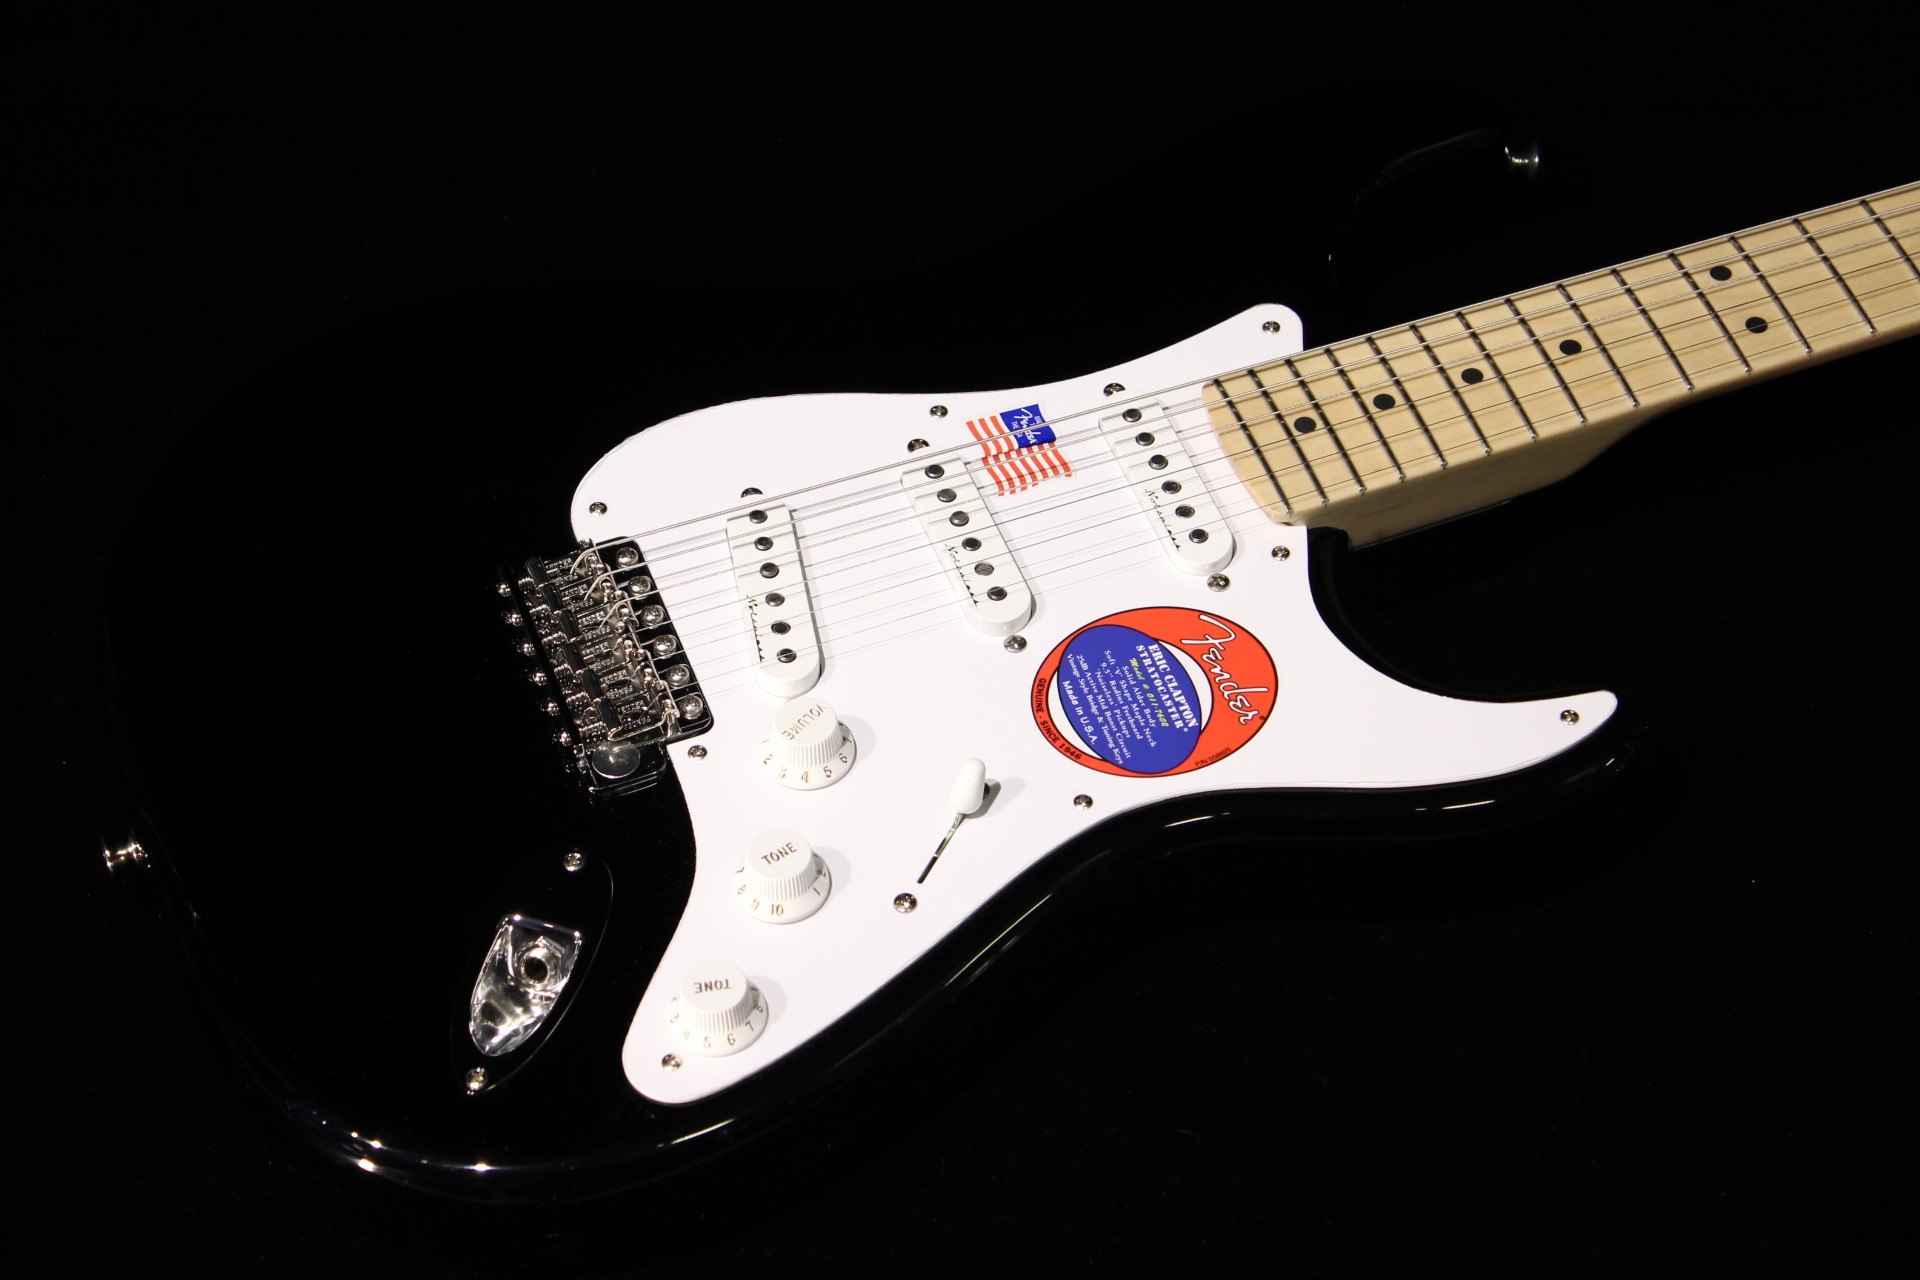 fender eric clapton stratocaster black gino guitars. Black Bedroom Furniture Sets. Home Design Ideas